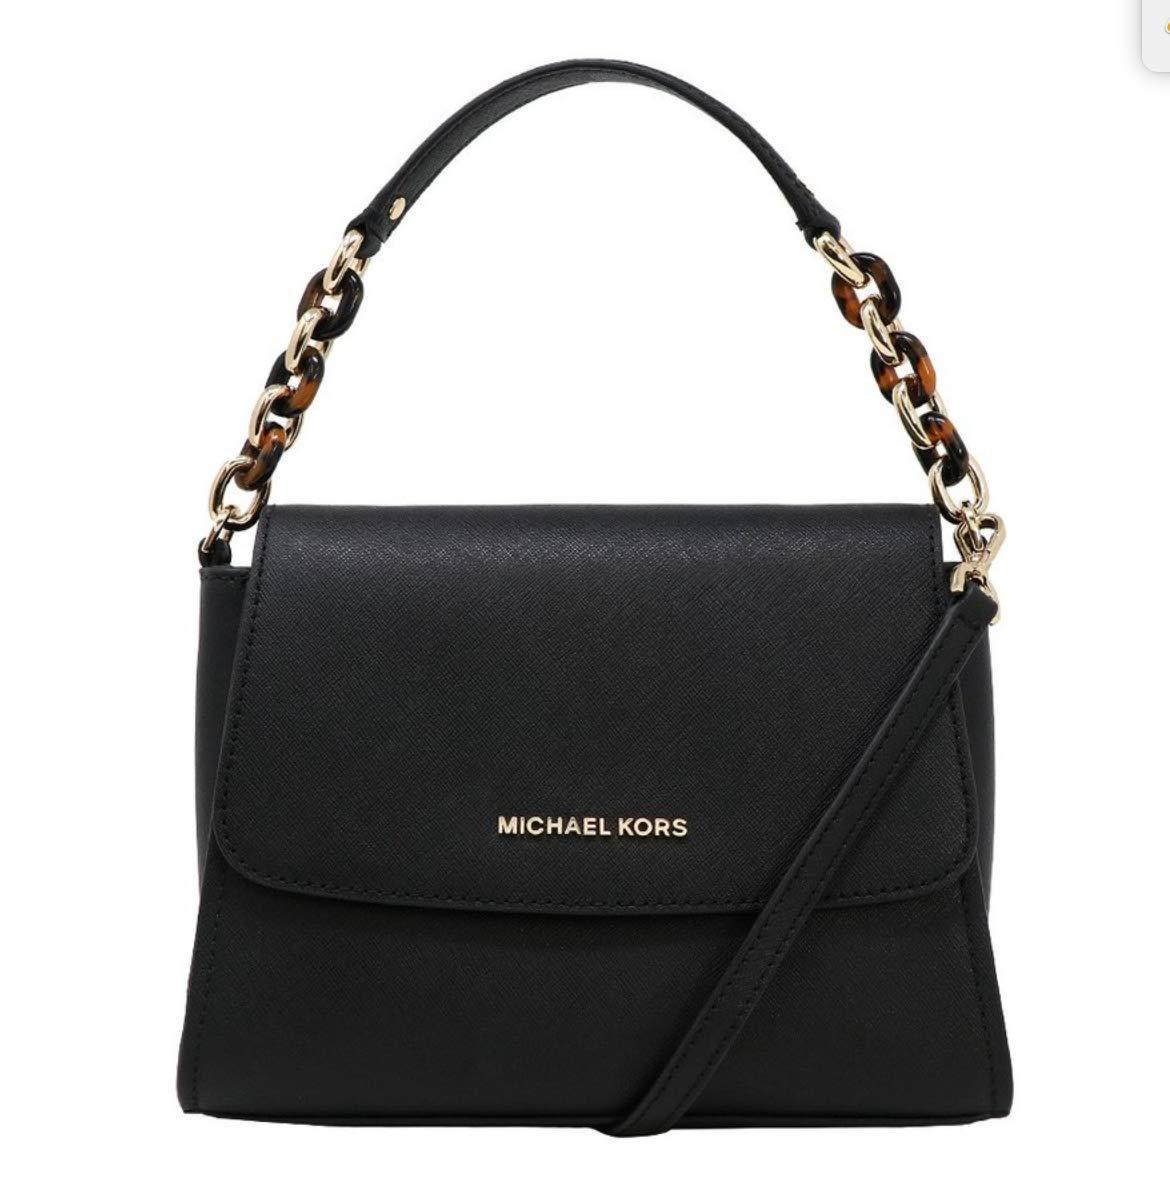 Michael Kors Sofia Portia Small East West Satchel Crossbody Bag in Black